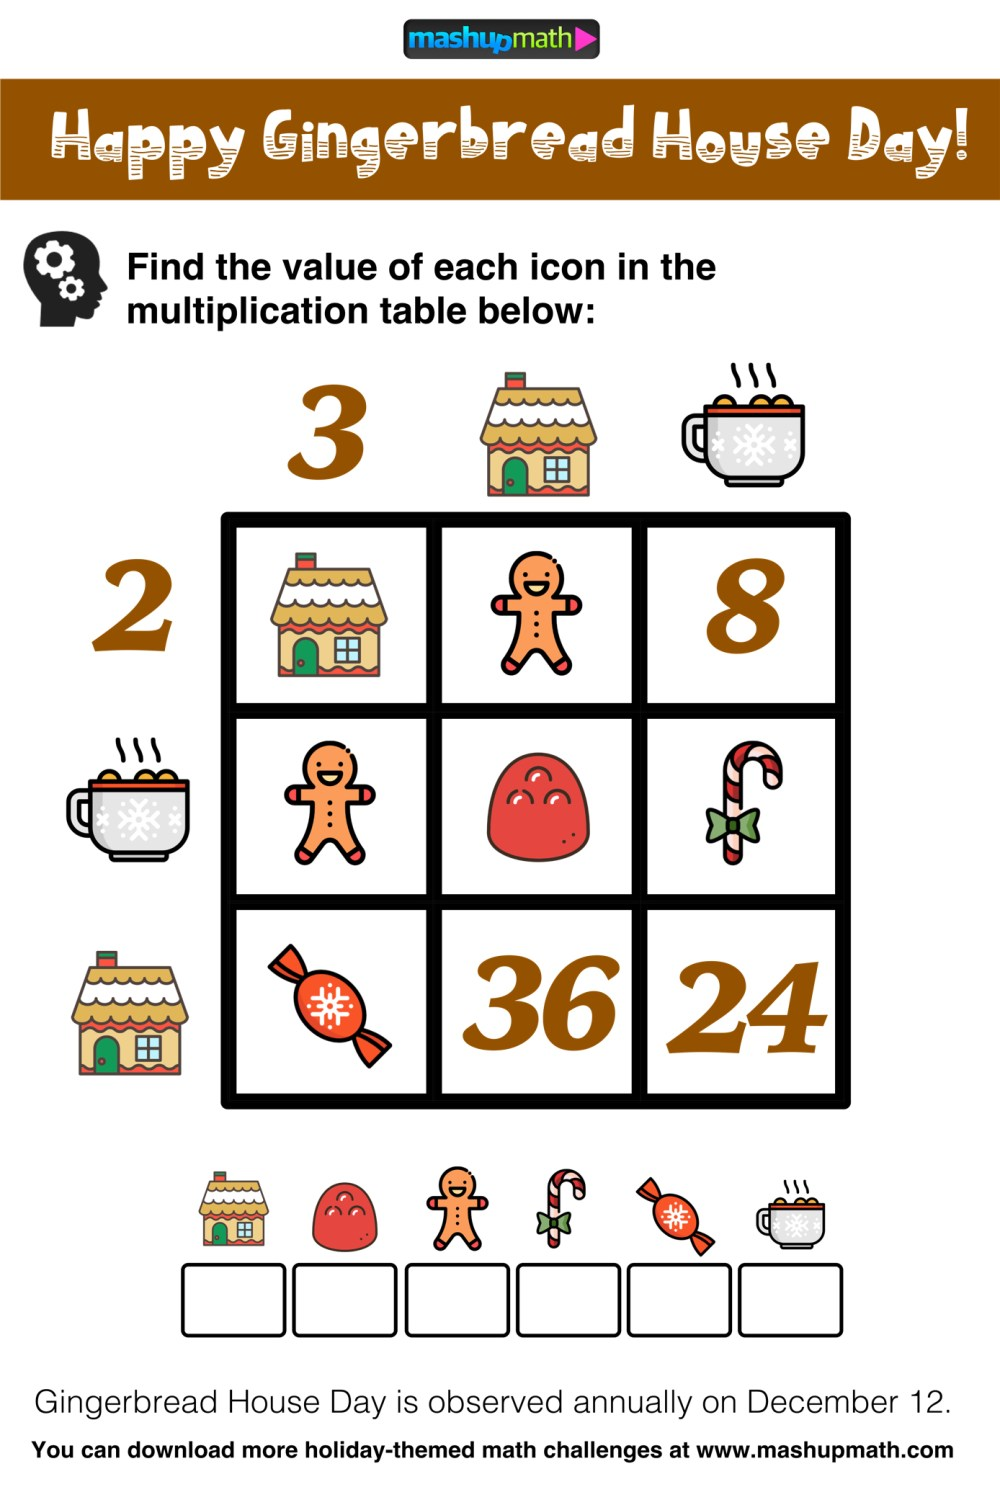 medium resolution of 5 Awesome Christmas Math Activities for 5th Grade — Mashup Math